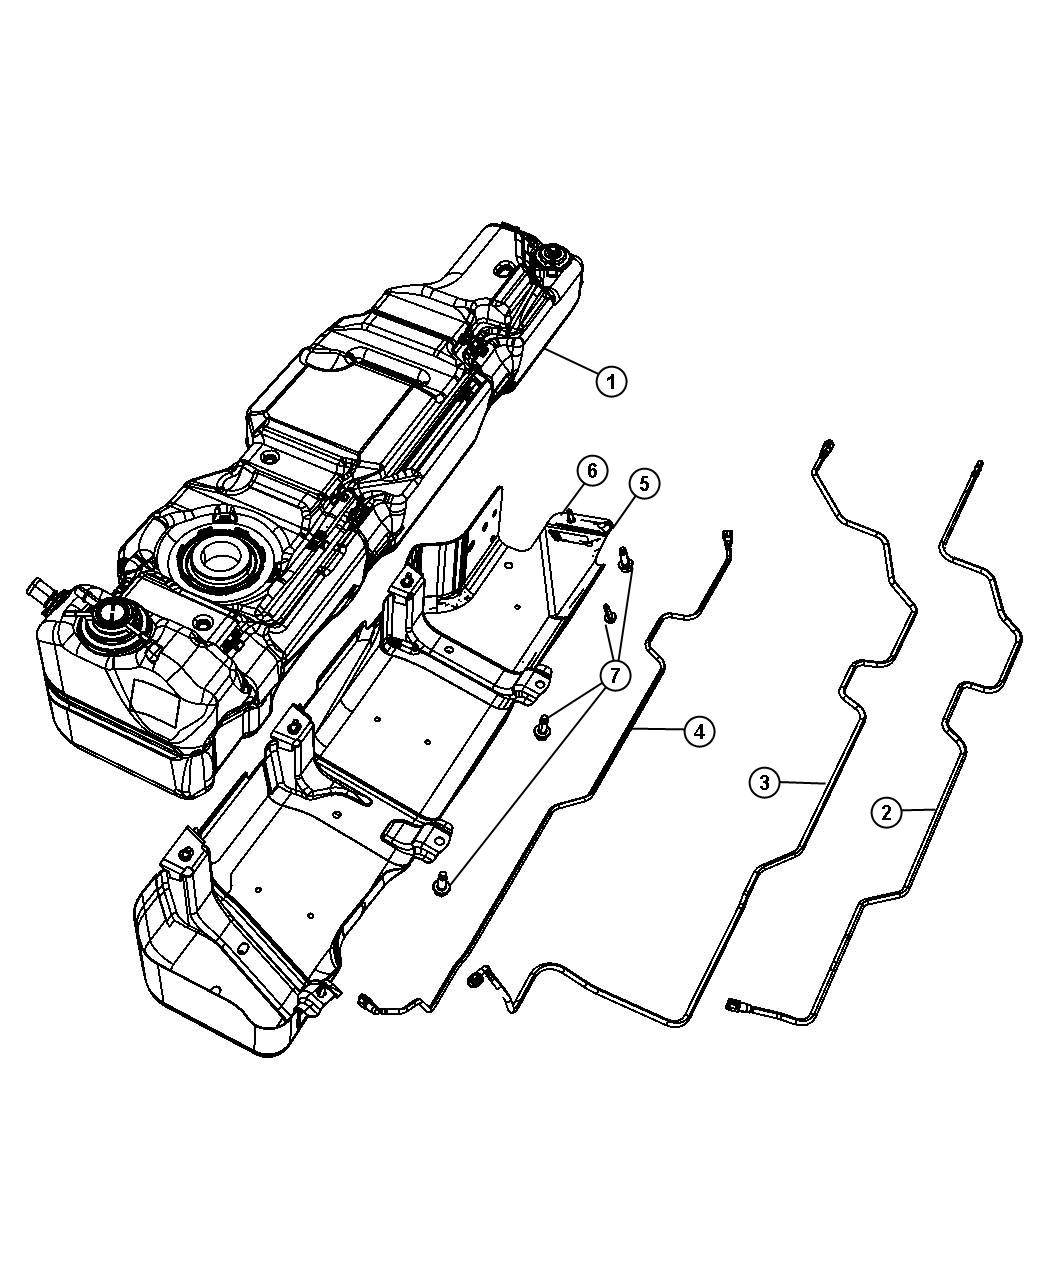 Jeep Wrangler Tank. Fuel. [17 gallon fuel tank], 17.6